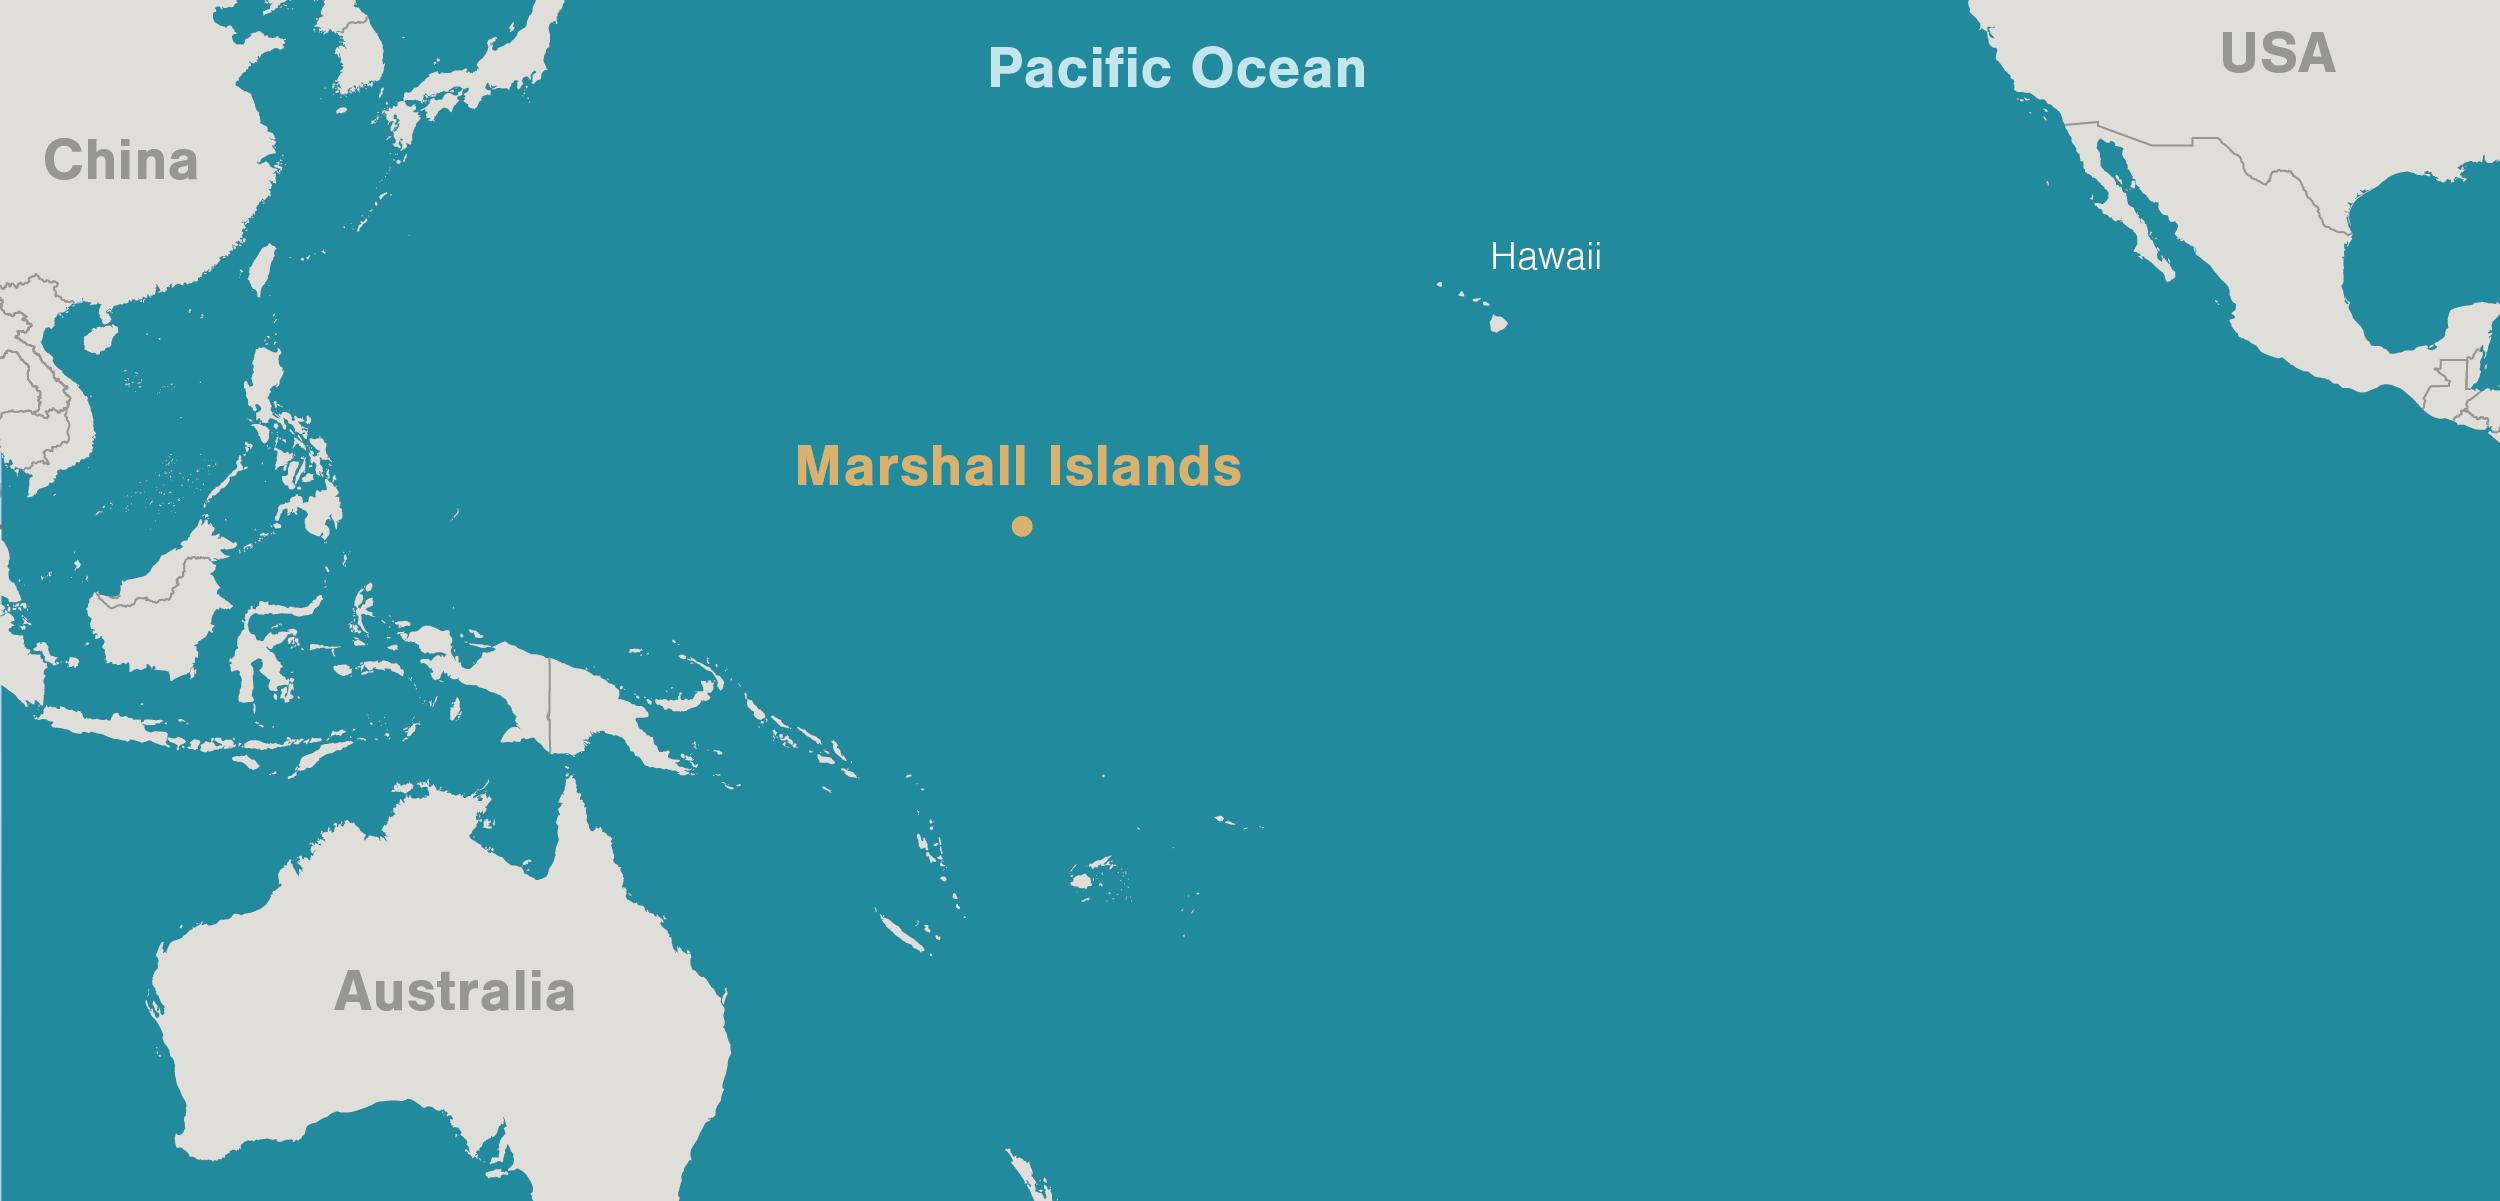 Marshal Islands map